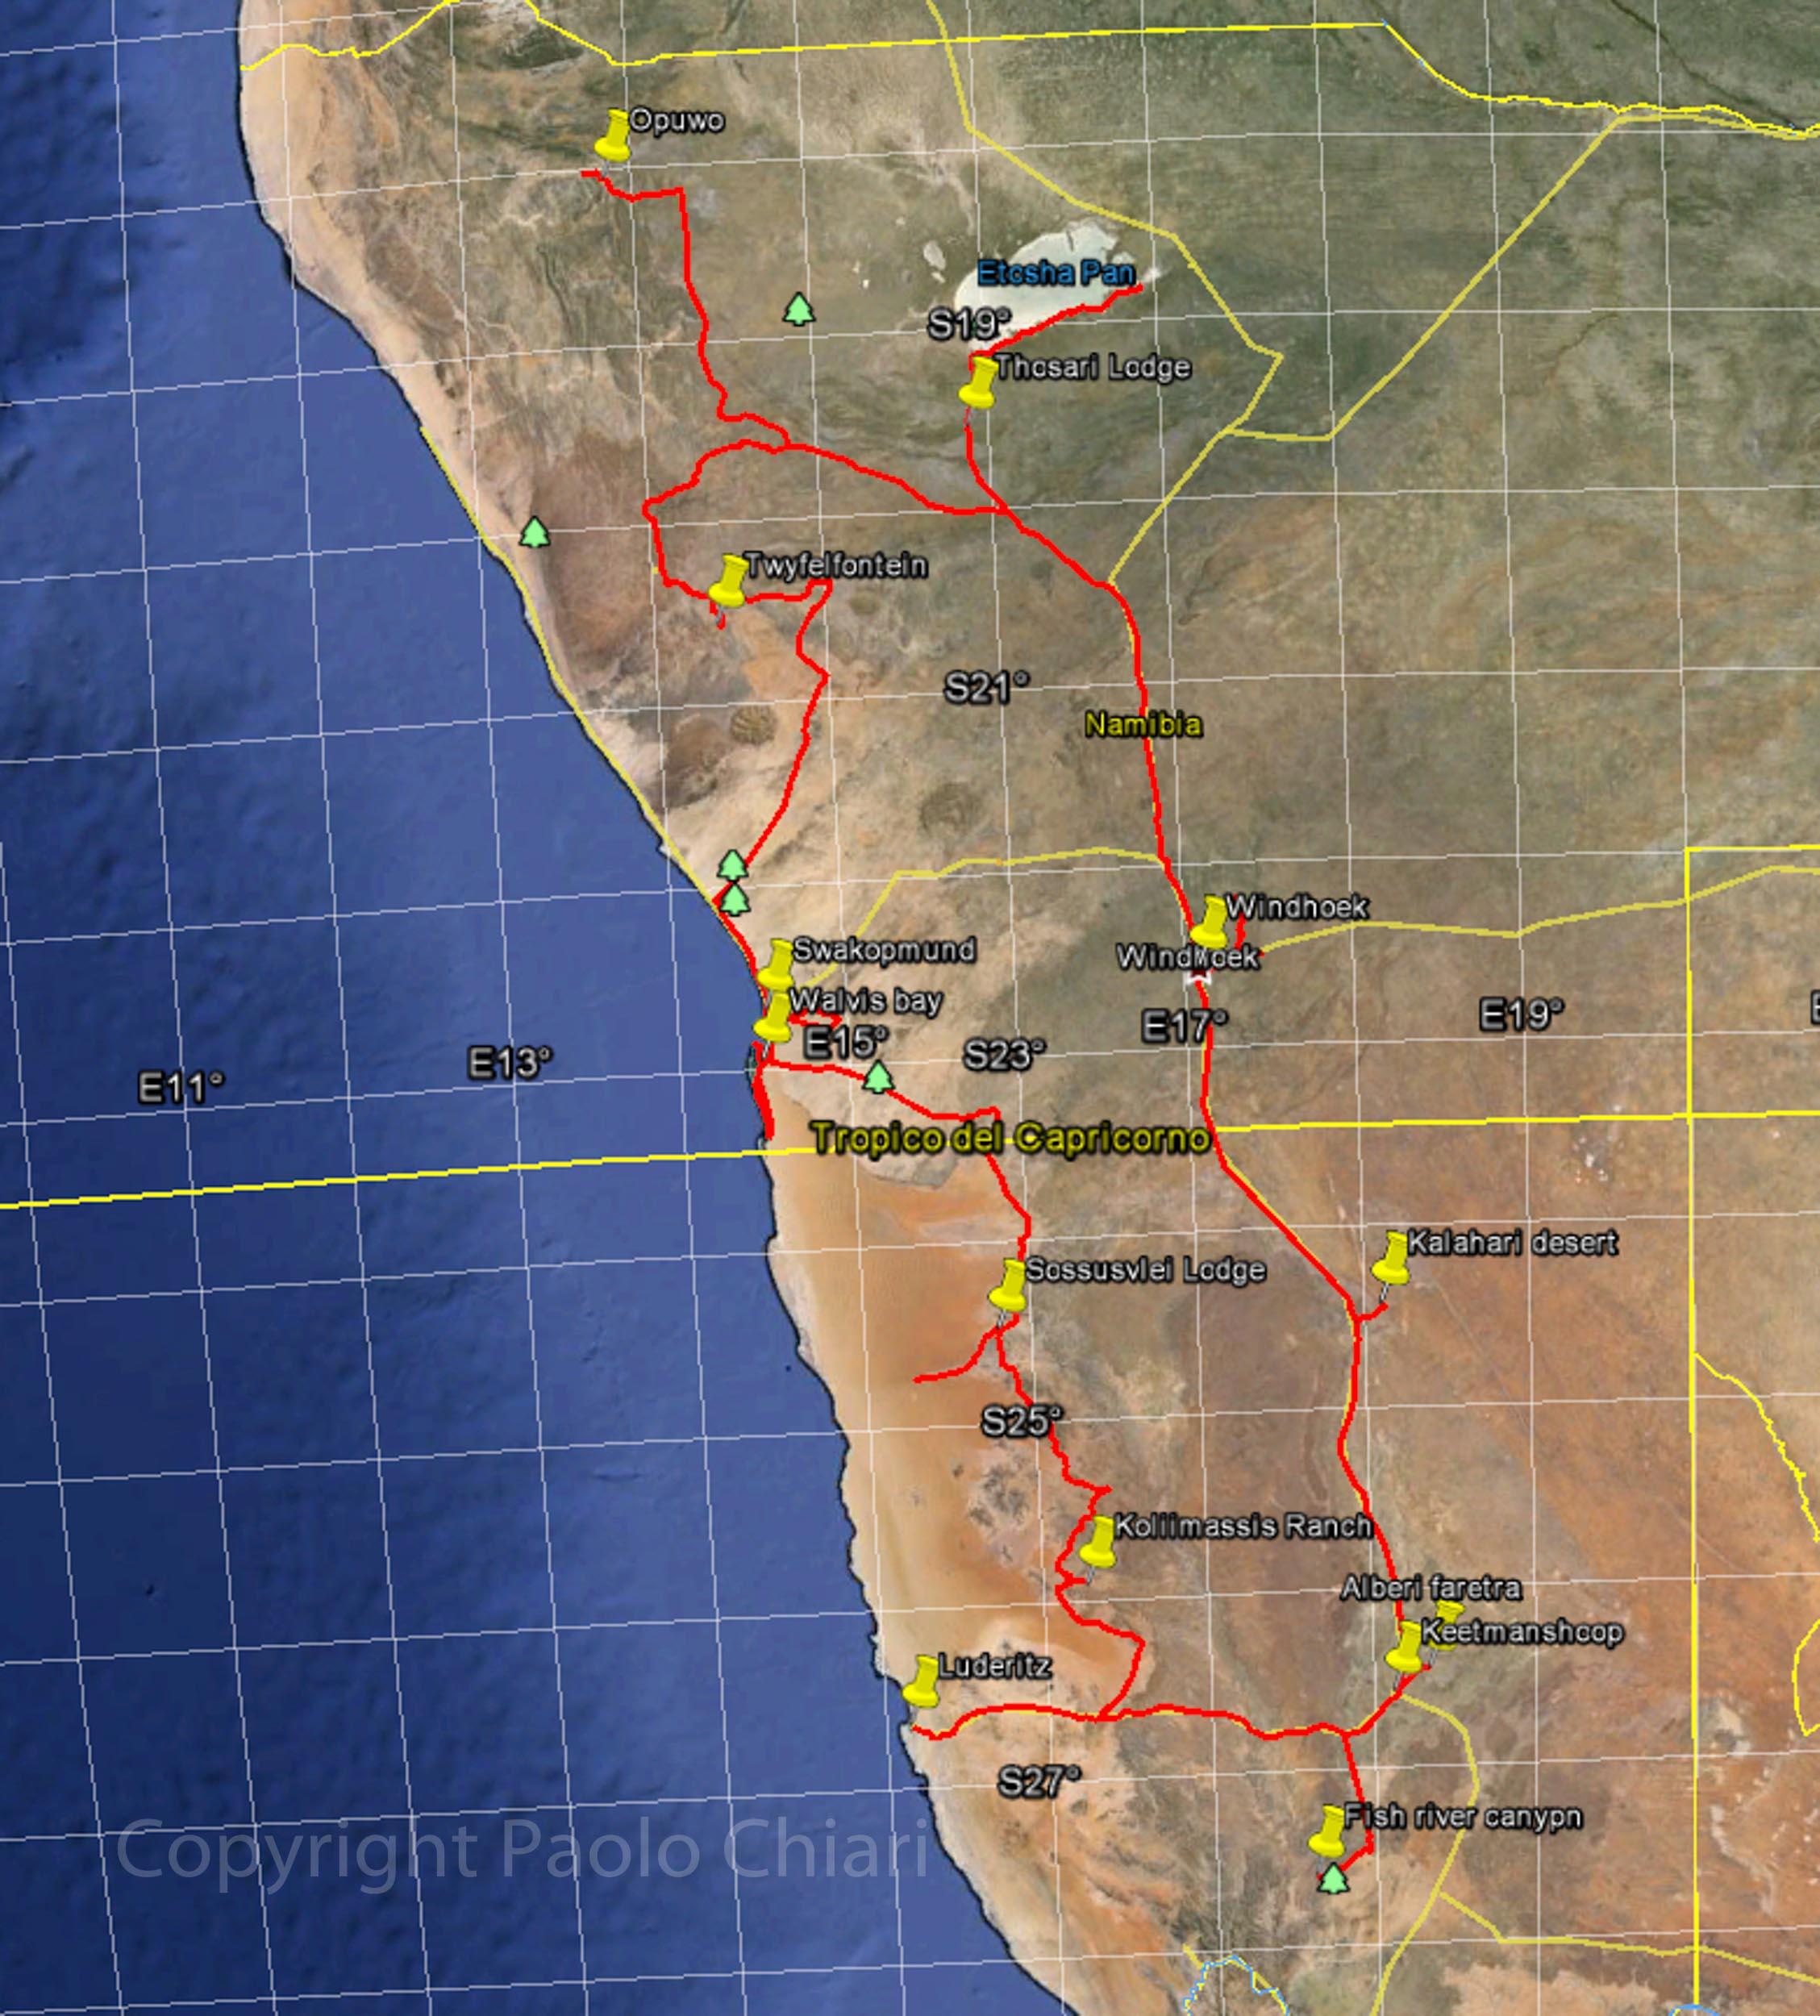 Percorso Namibia 2014